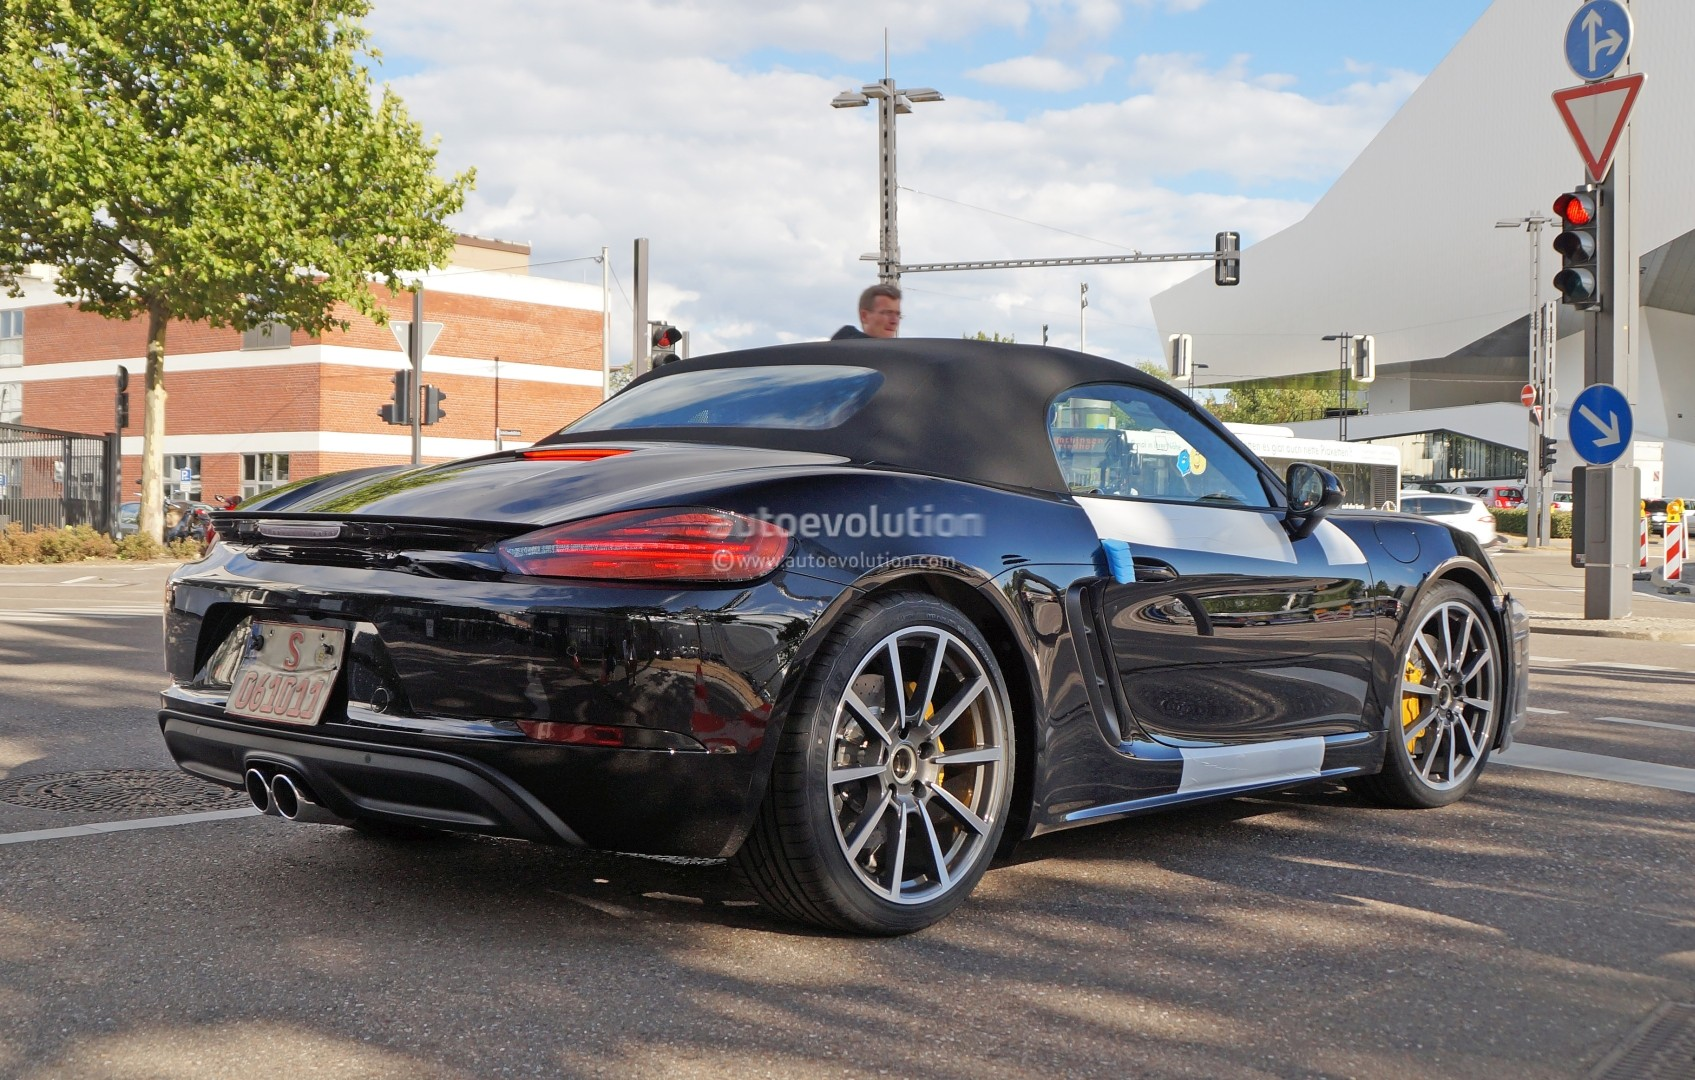 2017 Porsche Boxster Spied Nearly Camo Free In Stuttgart